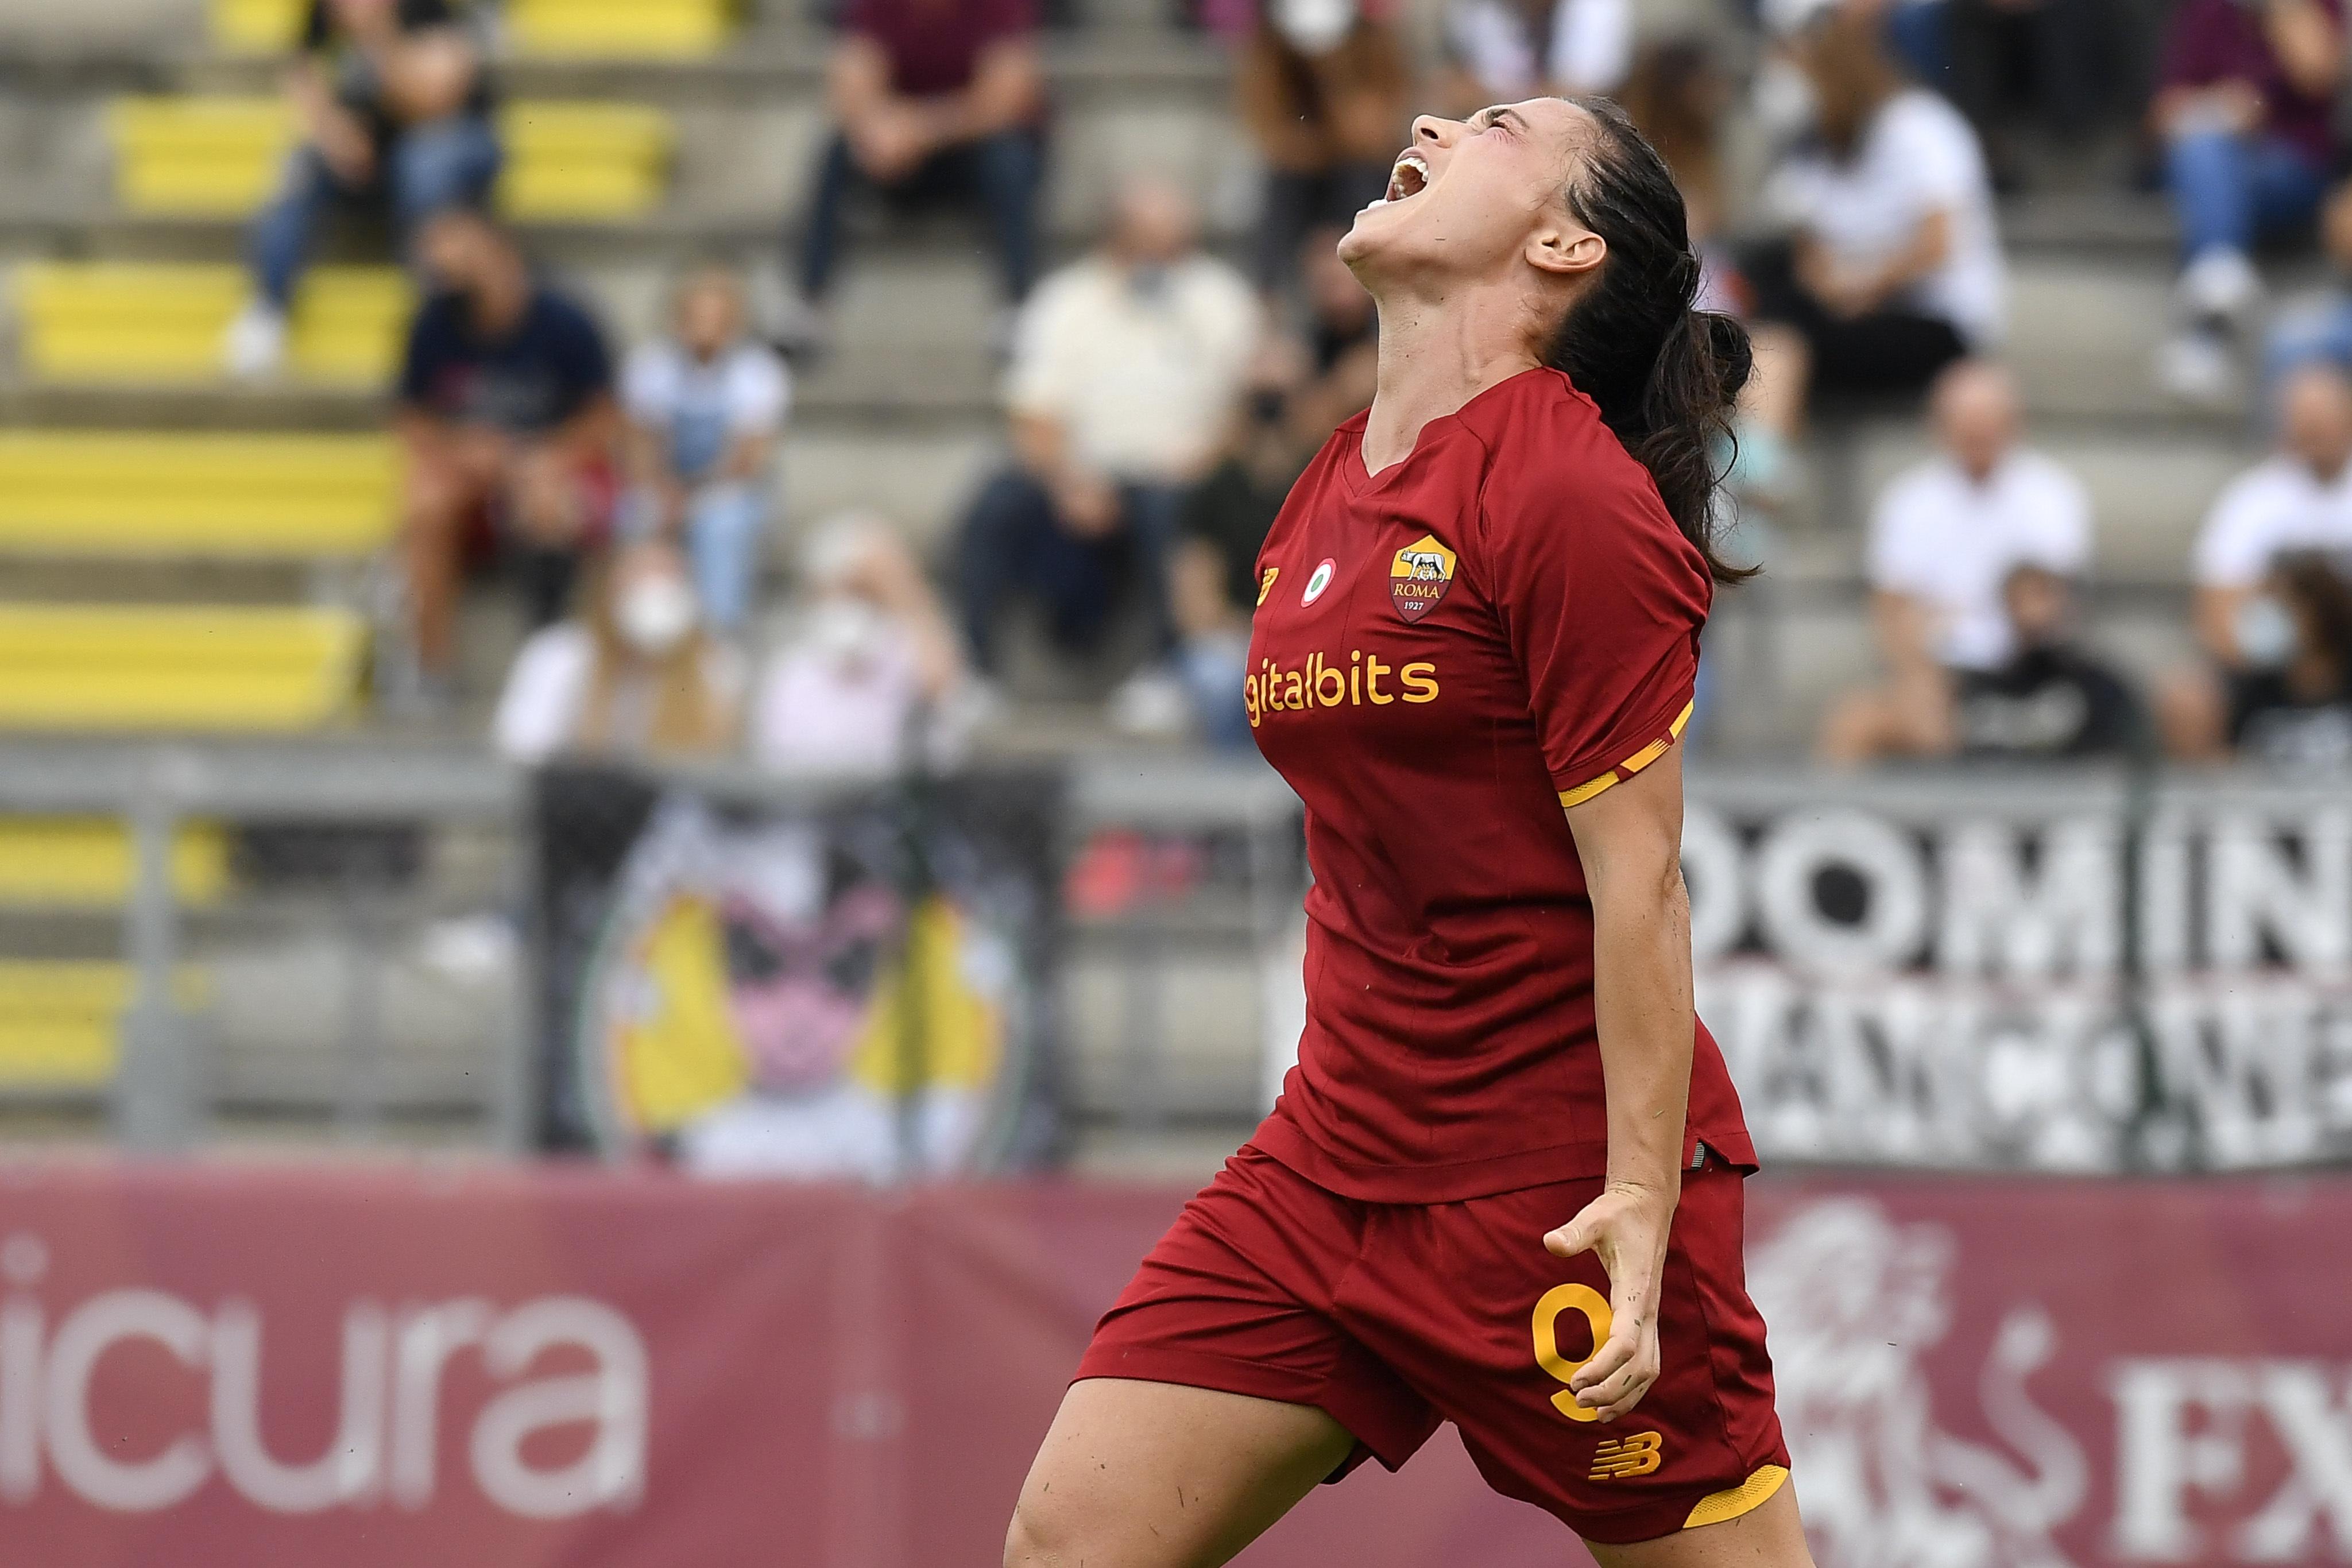 Roma v Juventus - Serie A Women